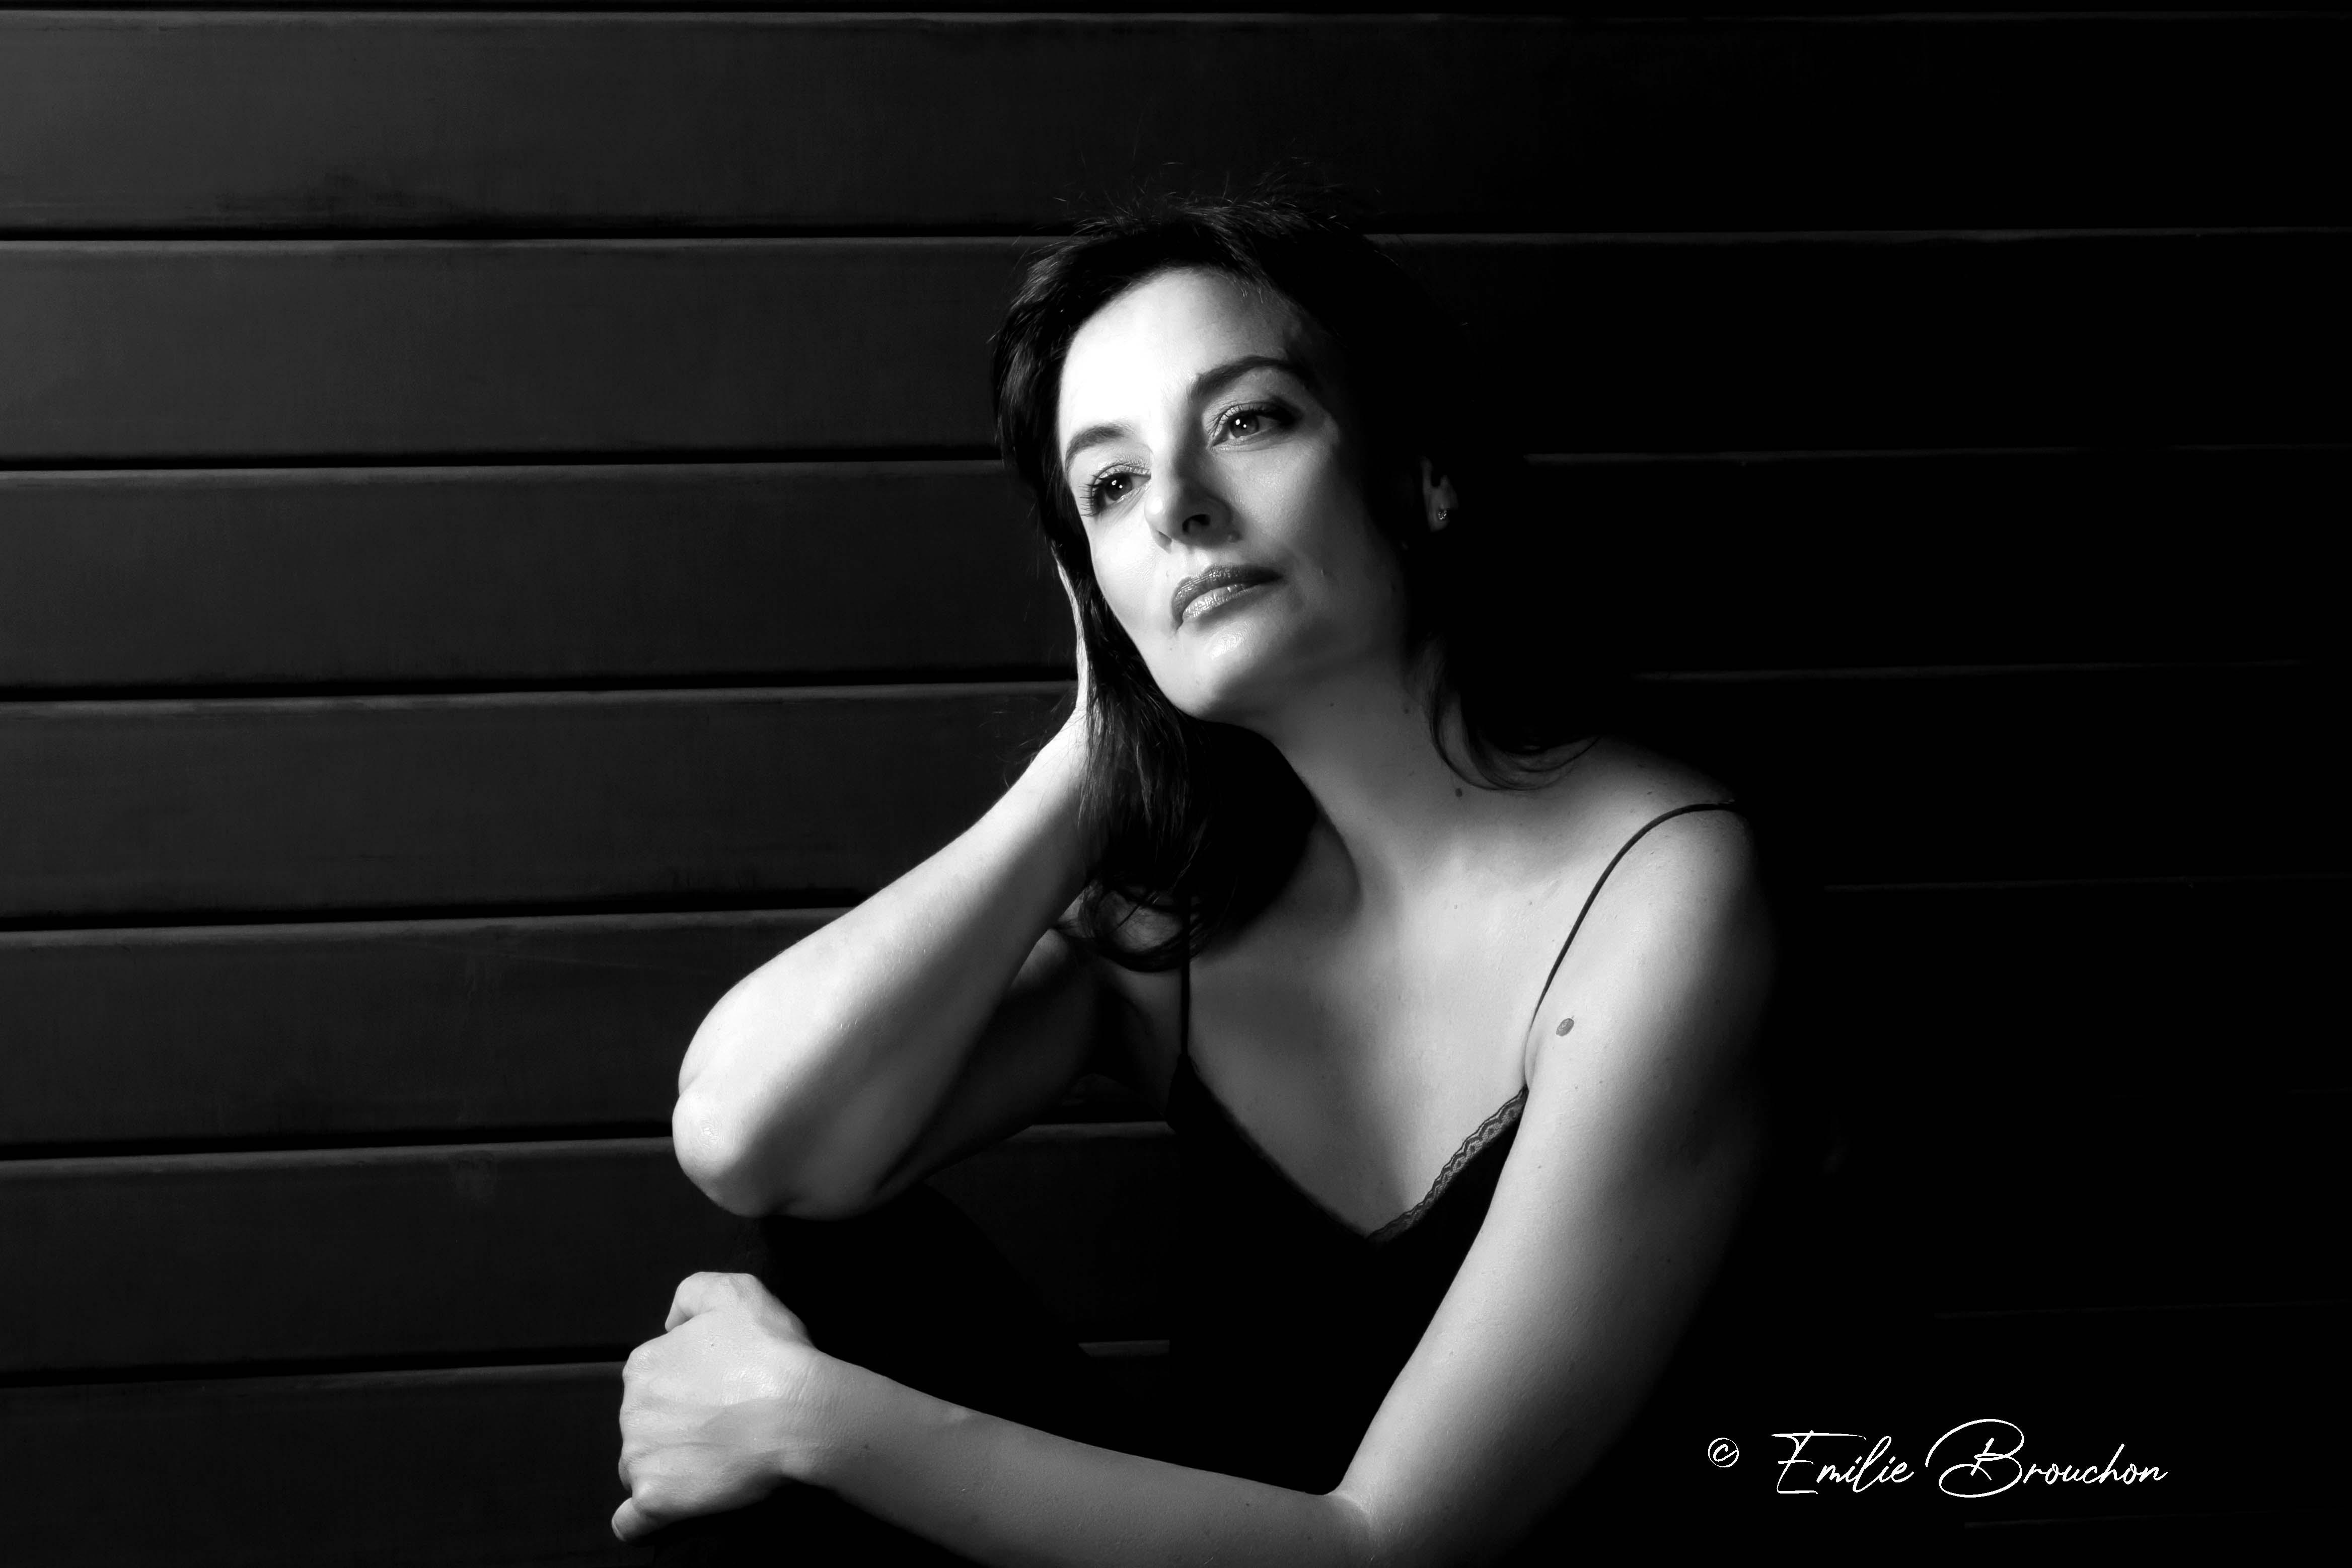 Cristina Marocco